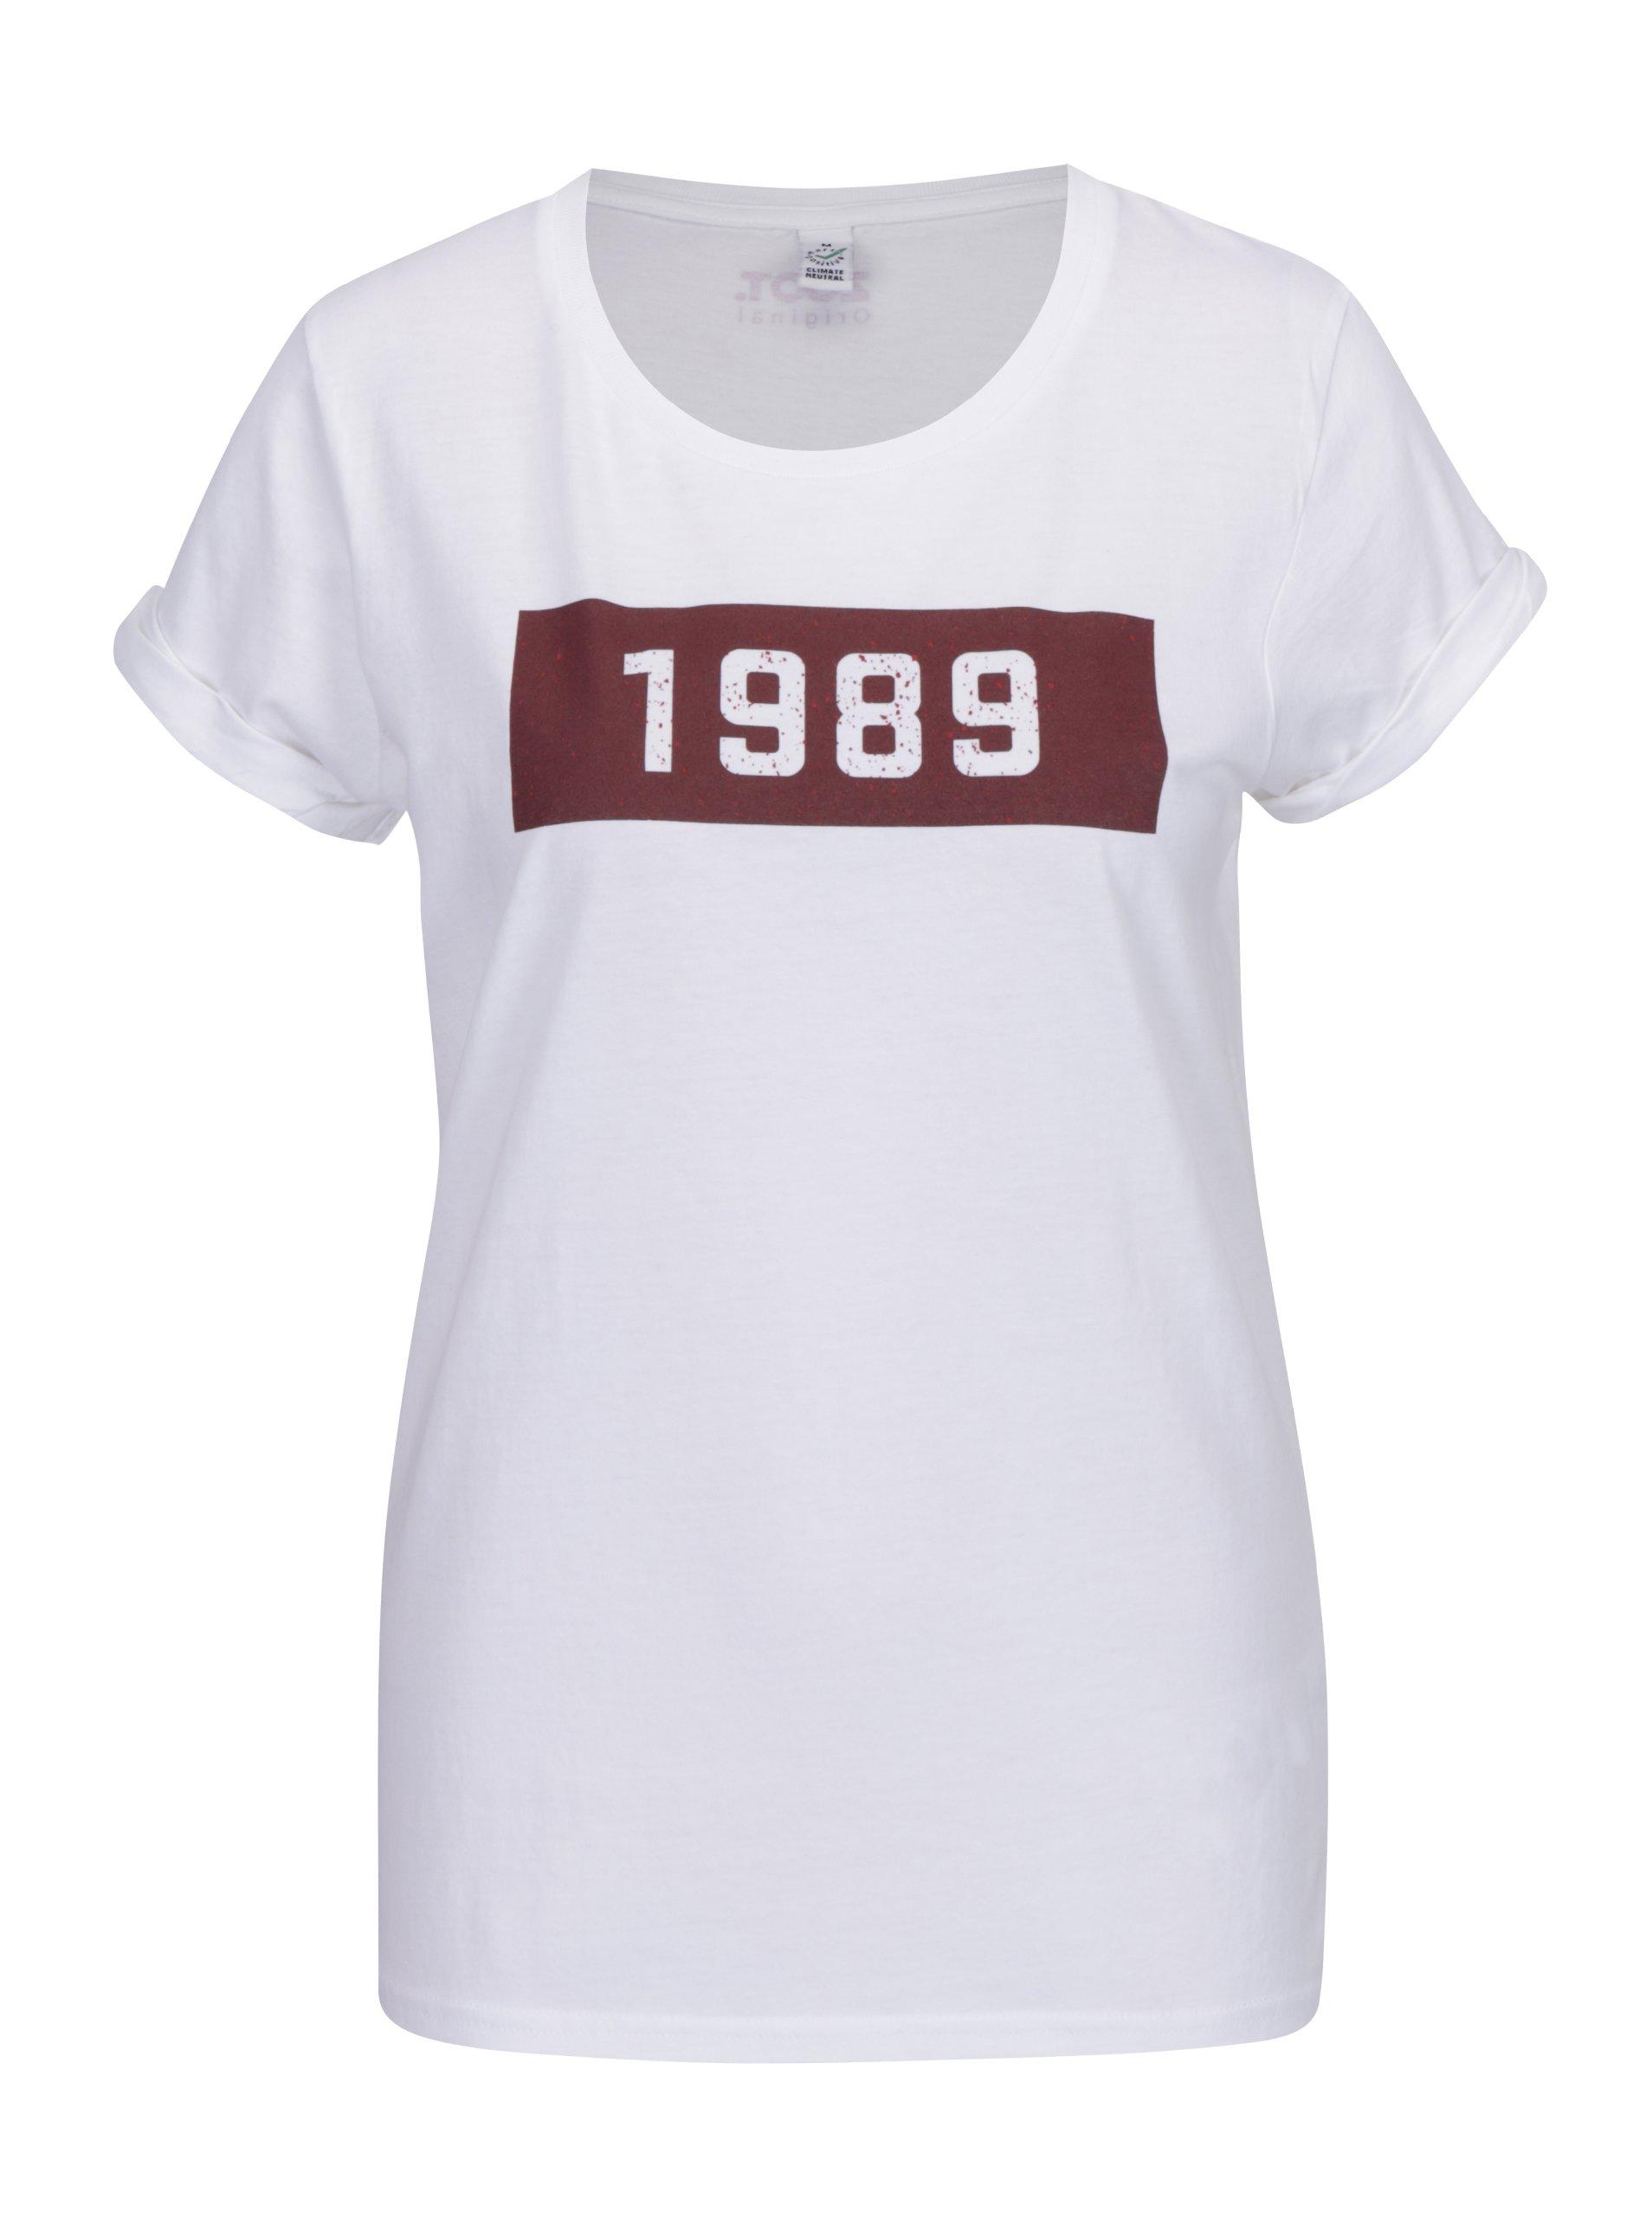 e14d24138d39 Biele dámske tričko s potlačou ZOOT Original 1989